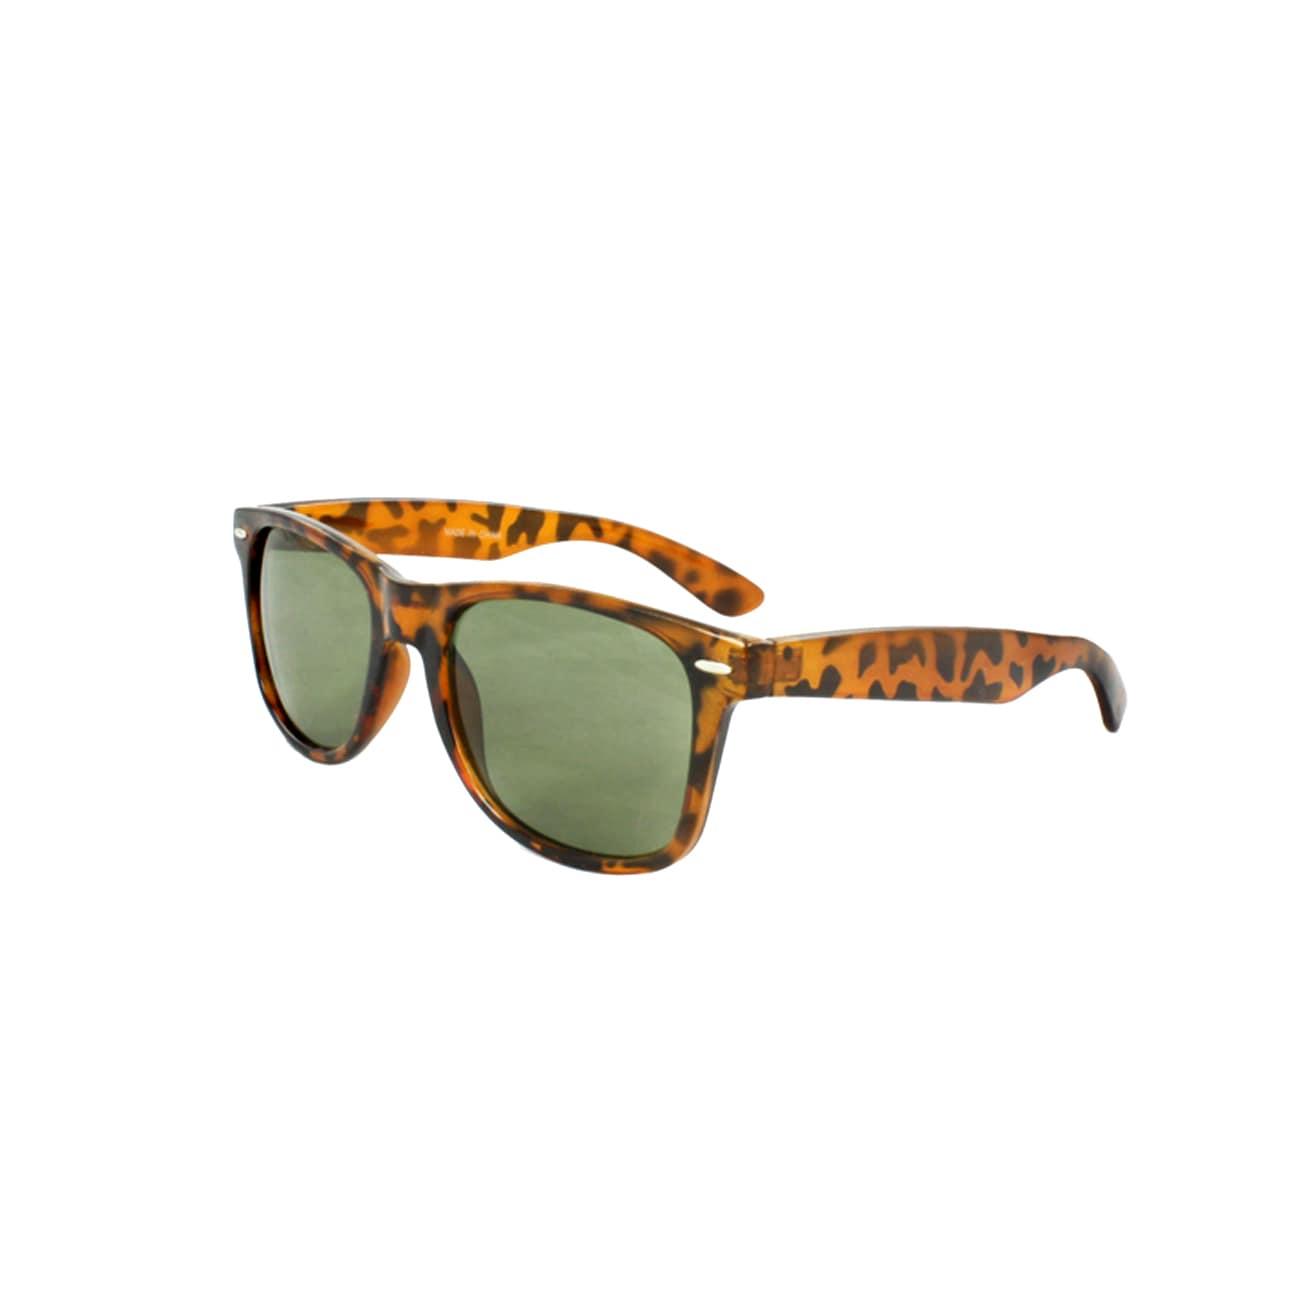 Unisex Brown Tortoise Sunglasses